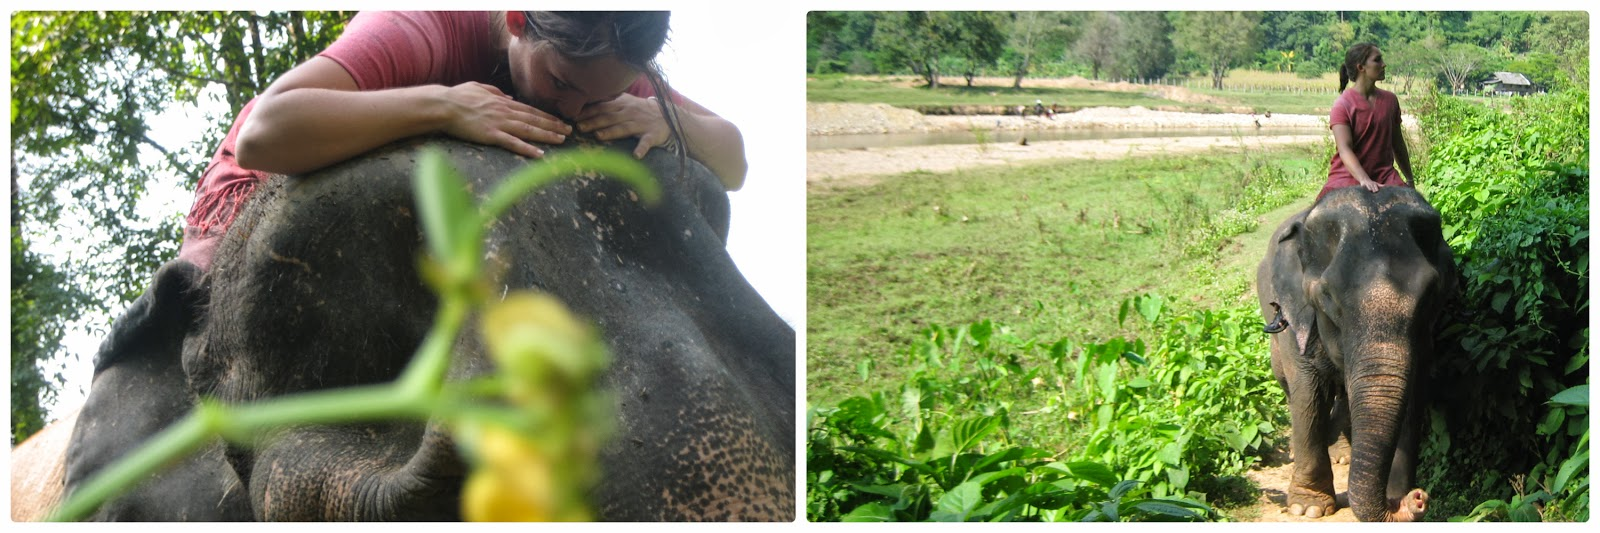 elephant-chiang-mai-thailand